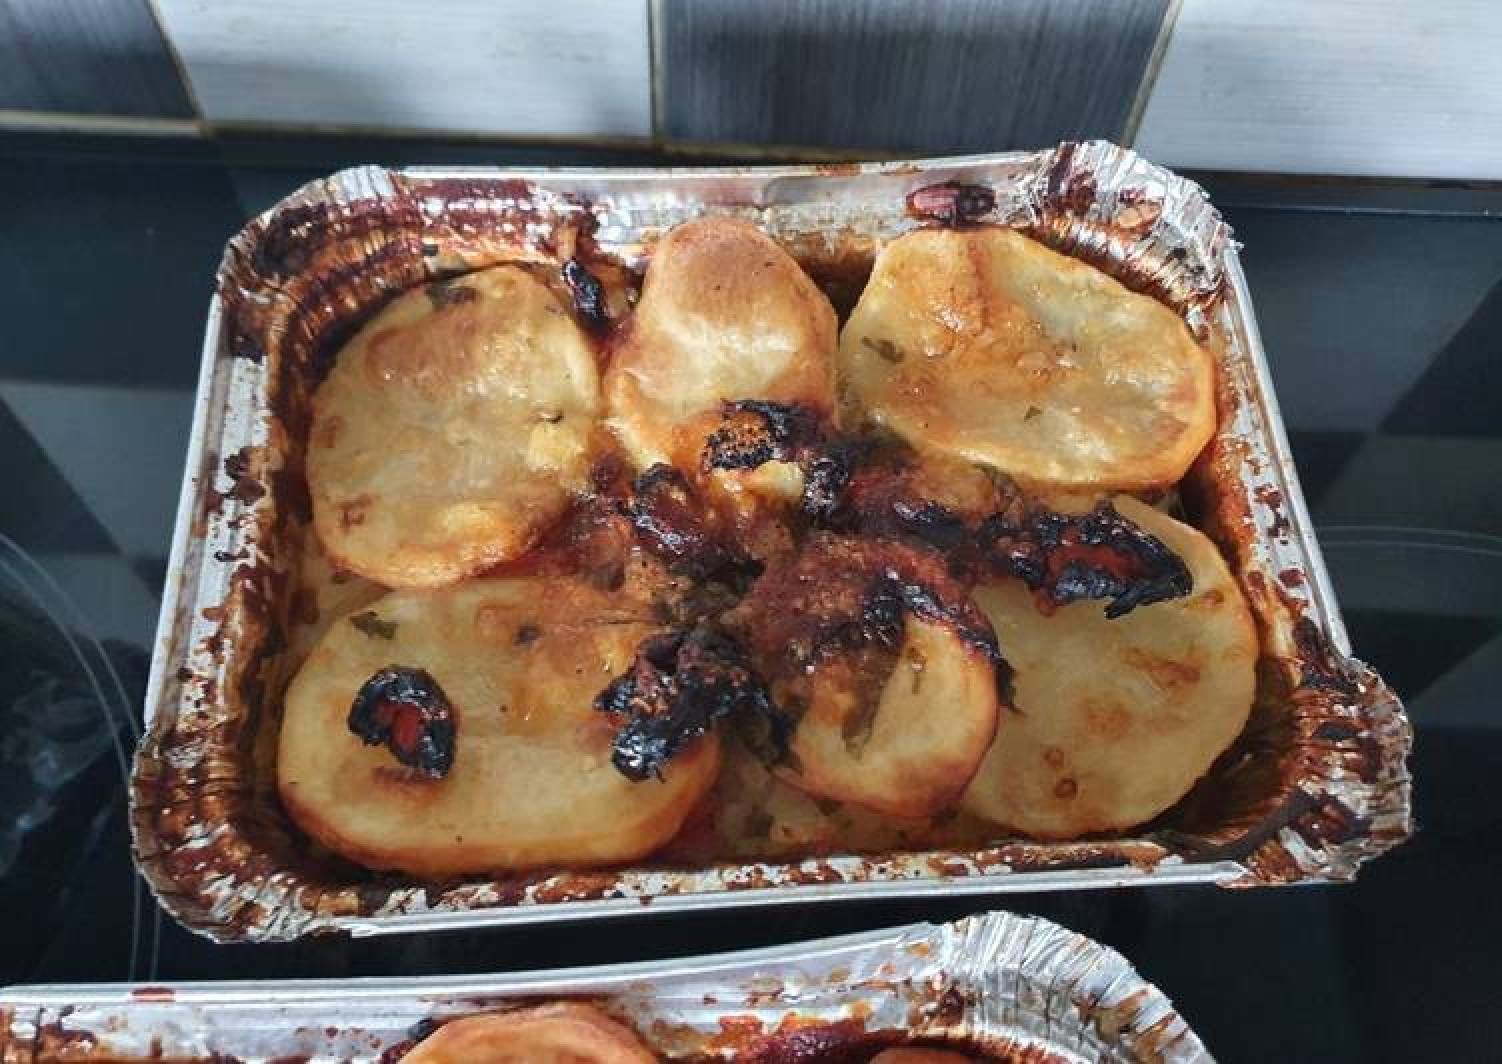 Patate riso e cozze (potato, rice and mussels)